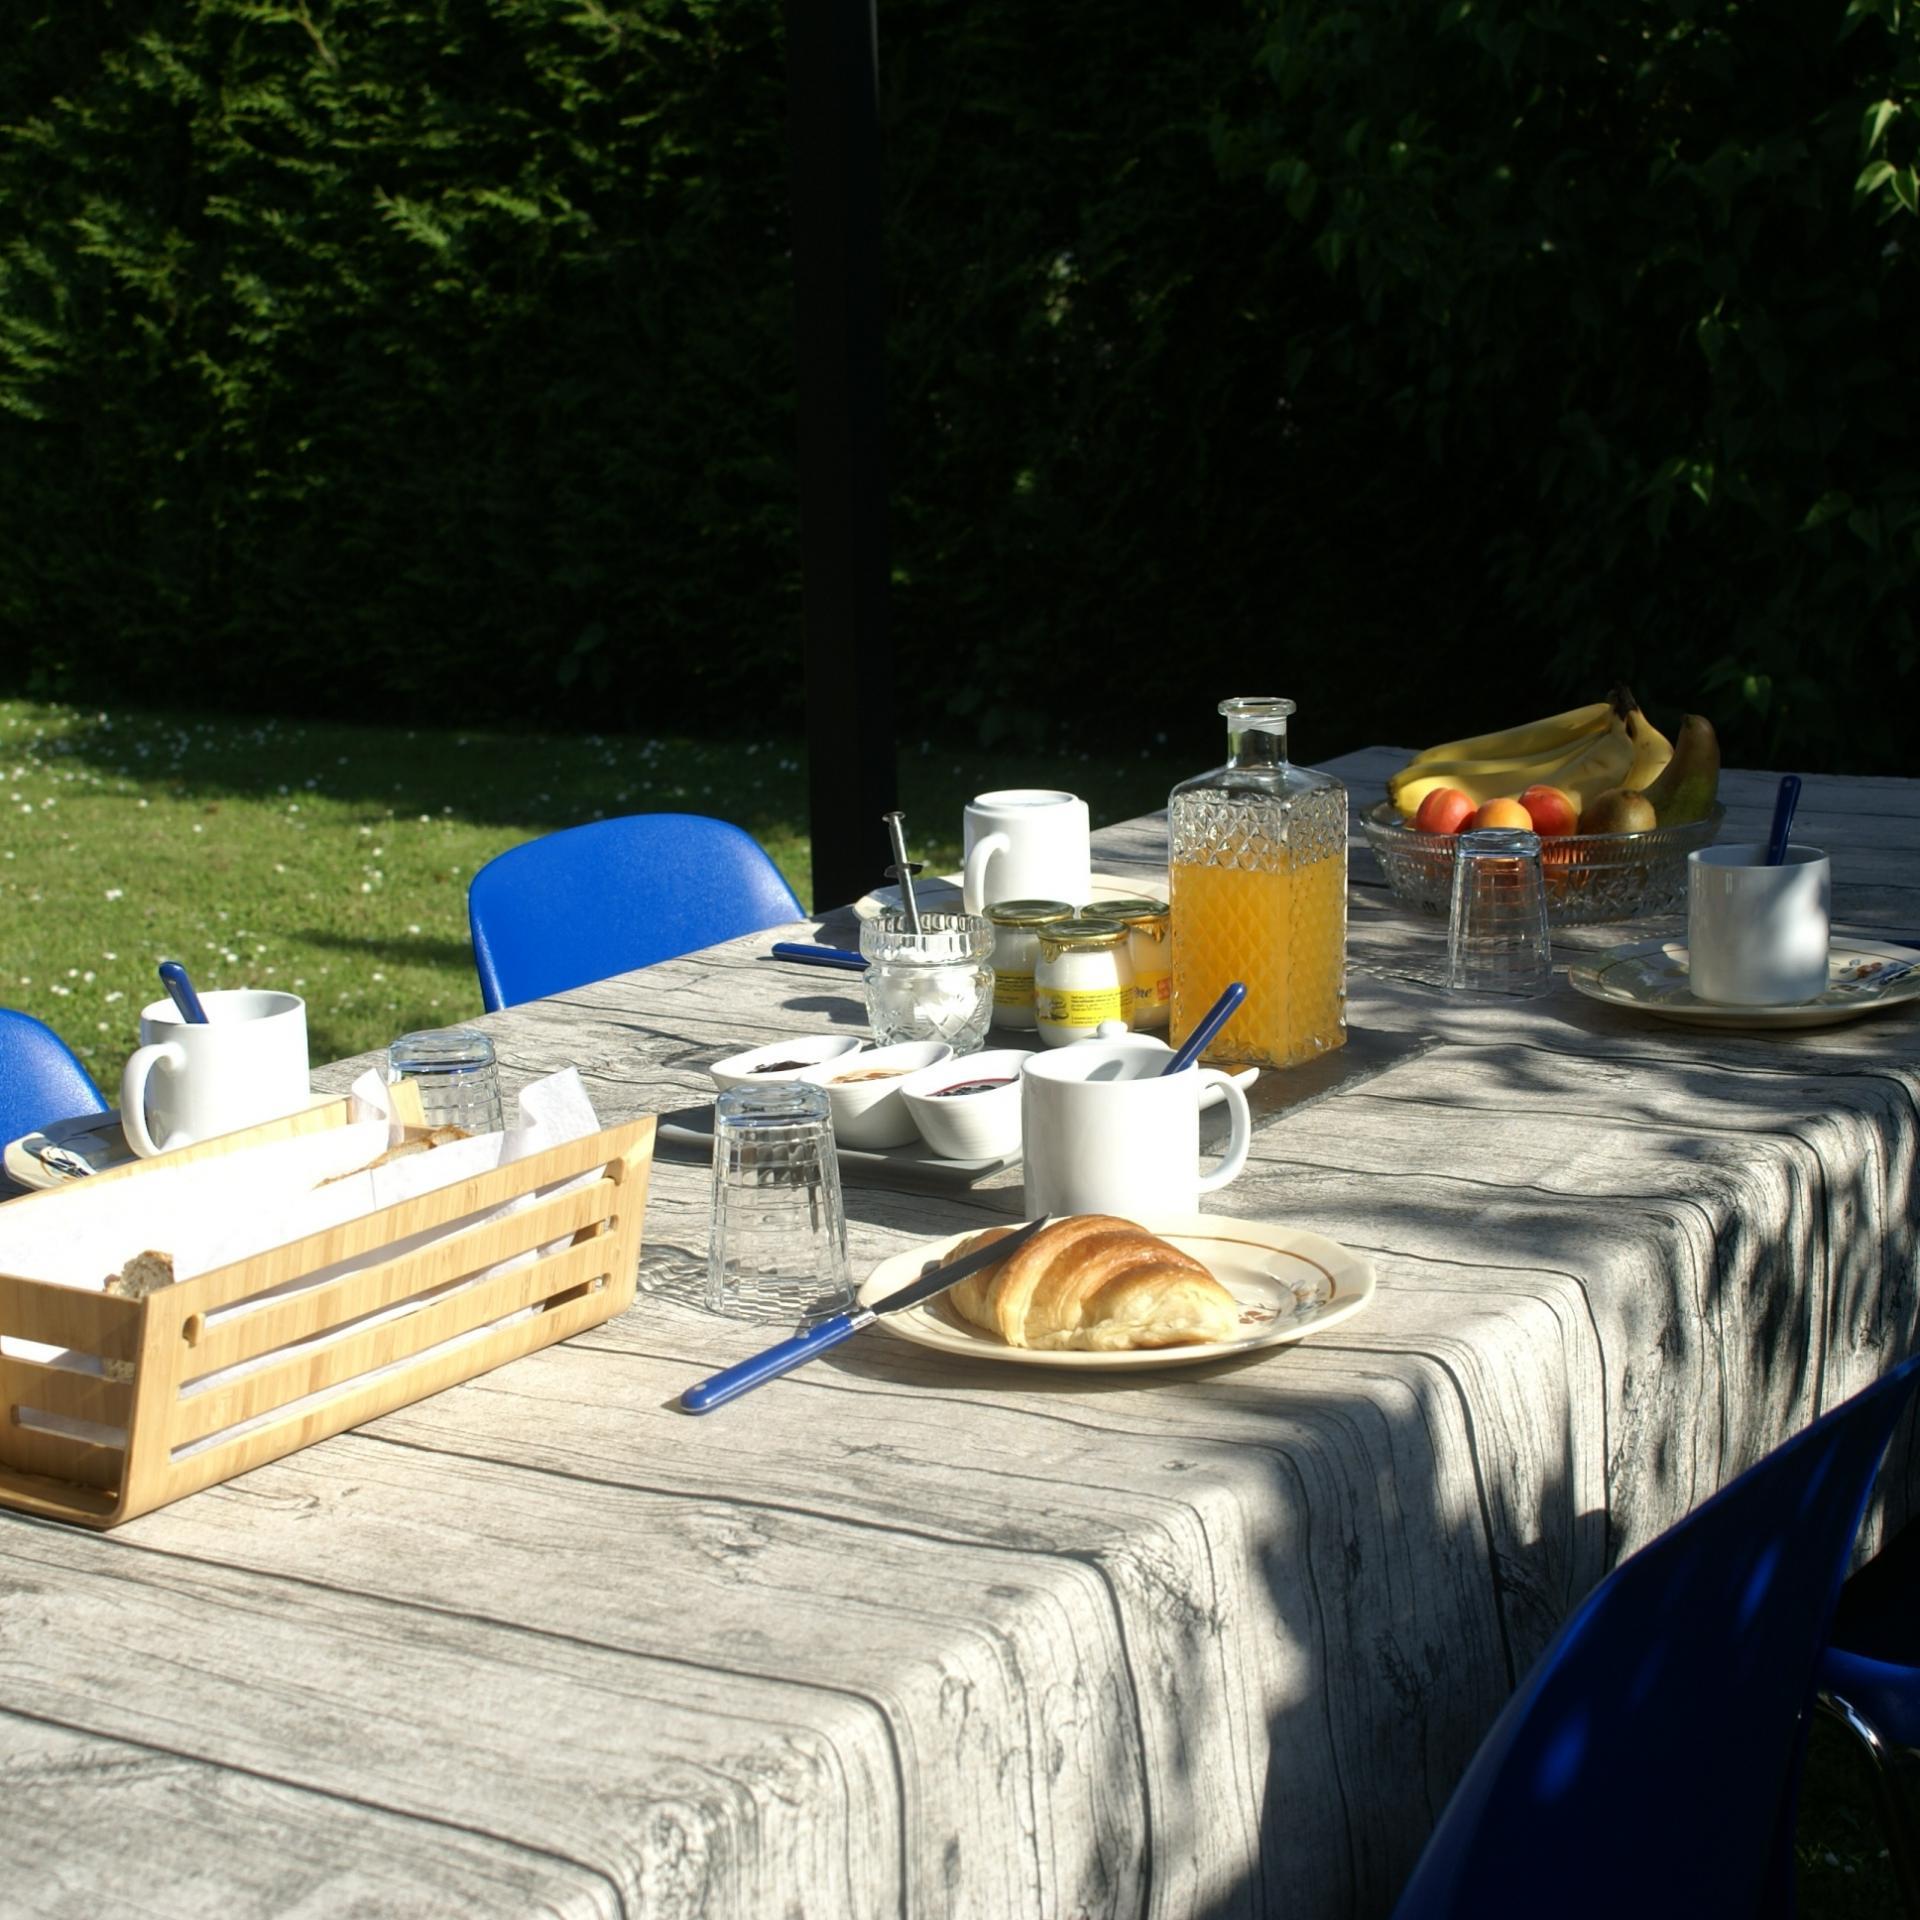 A outdoor breakfast